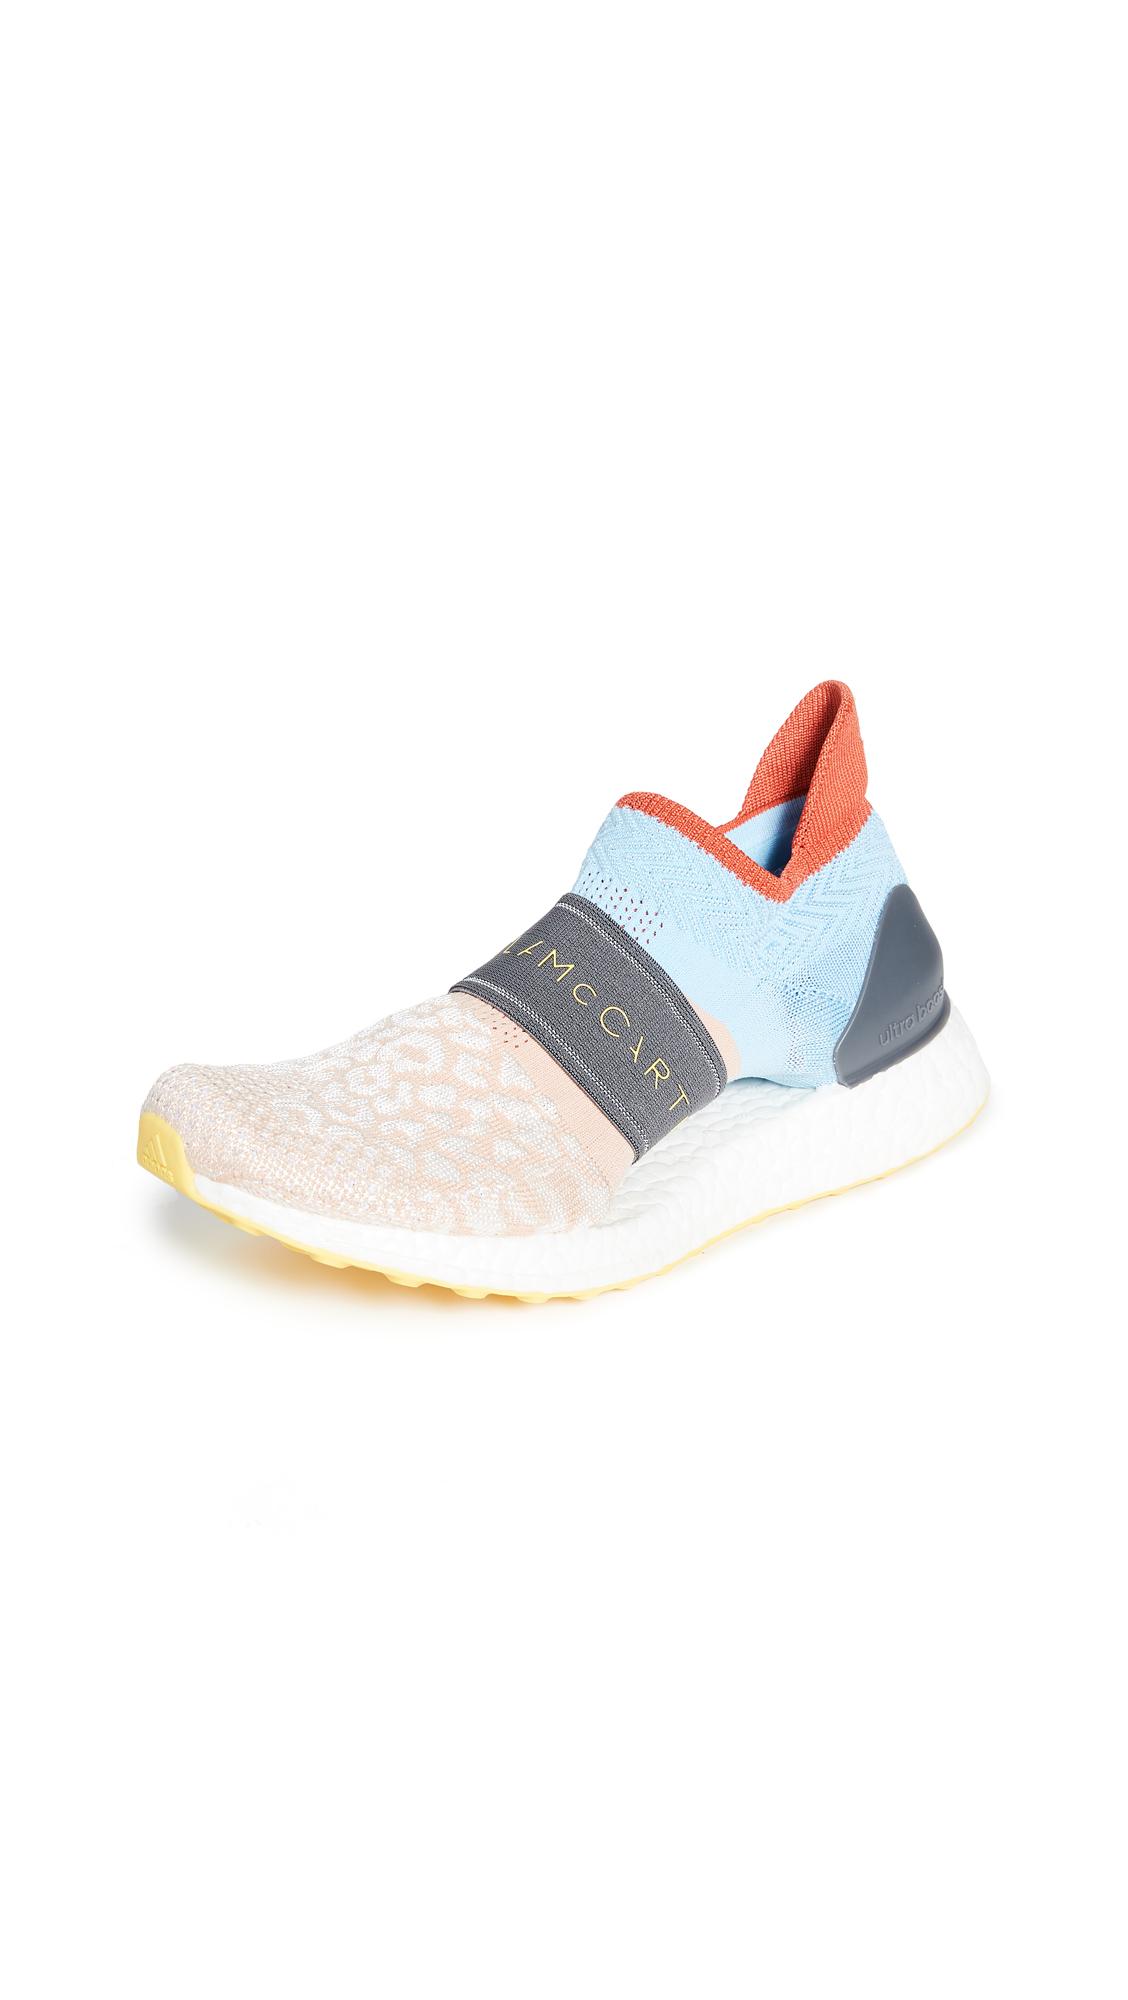 adidas by Stella McCartney Ultraboost X 3. D.S. Sneakers - Soft Powder/Grey/Vivid Yellow